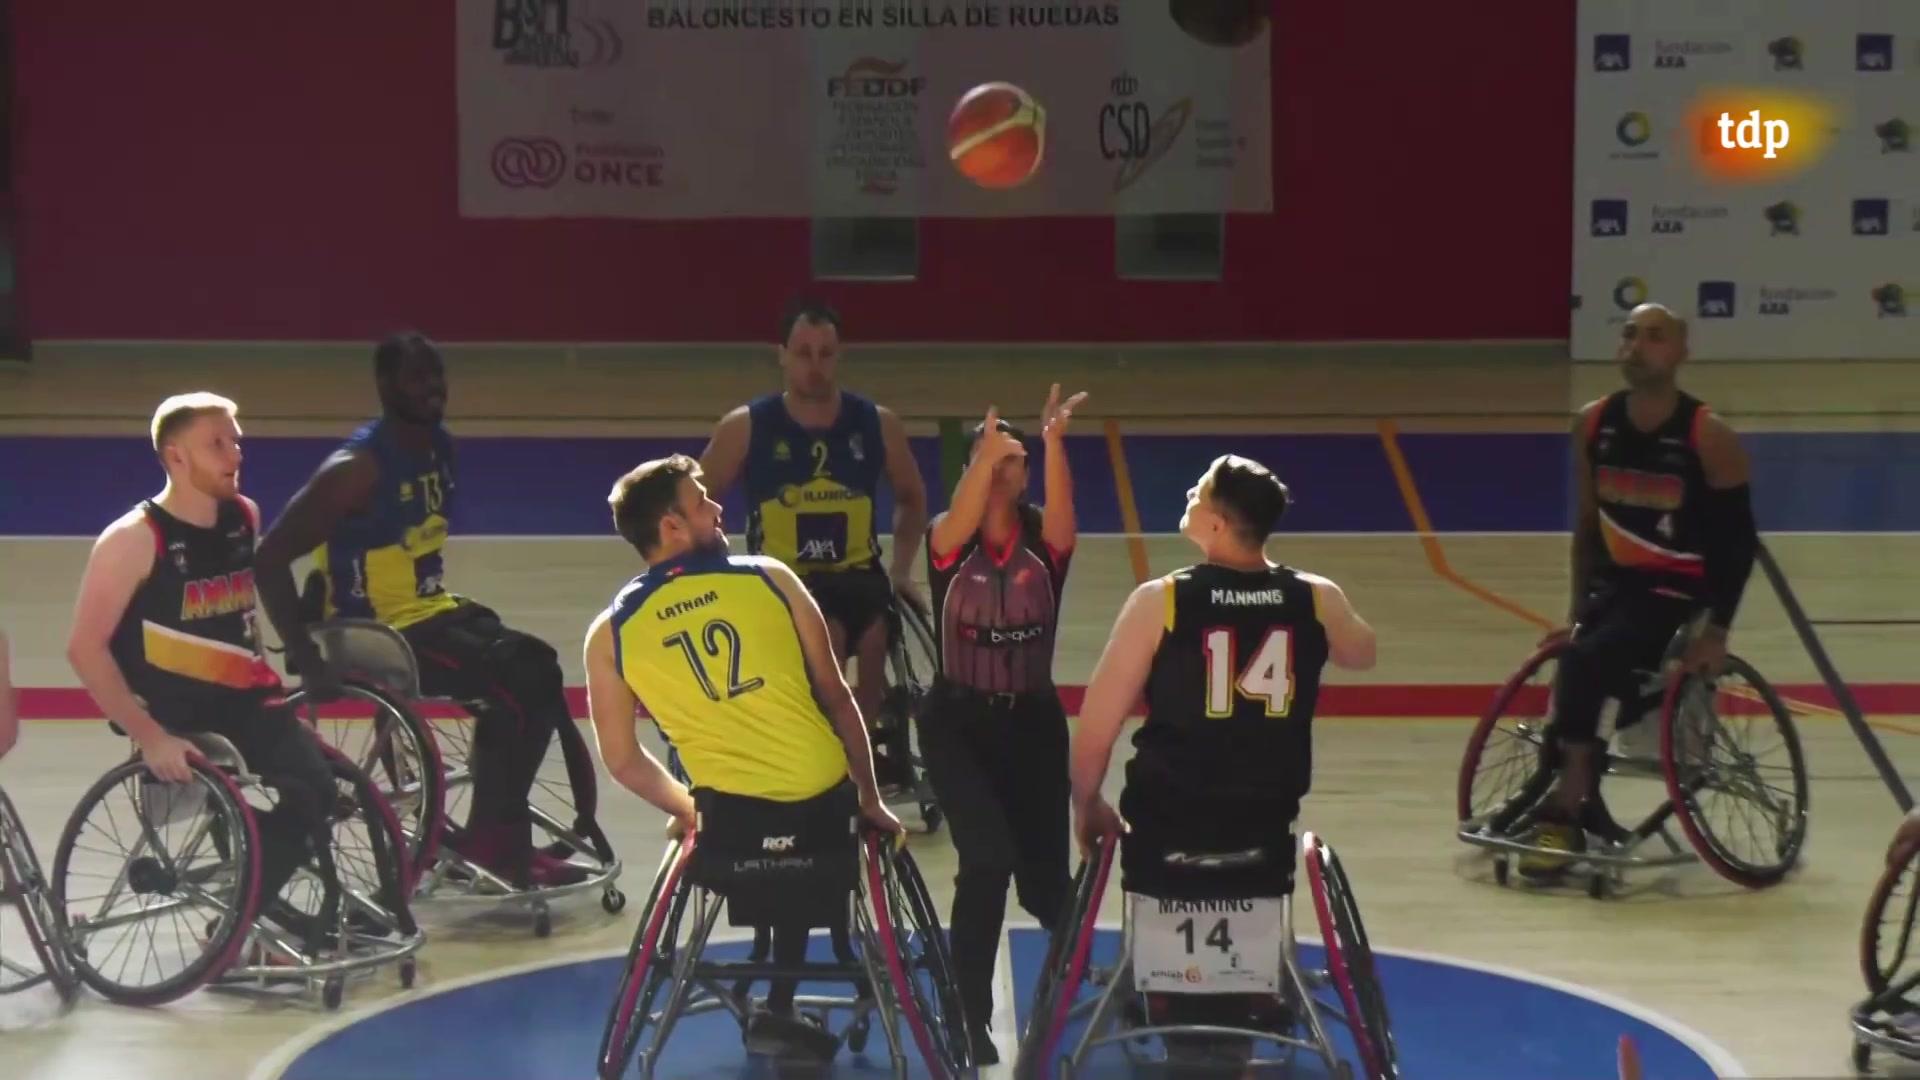 Baloncesto en silla de ruedas - Liga BSR División honor. Resumen jornada 19